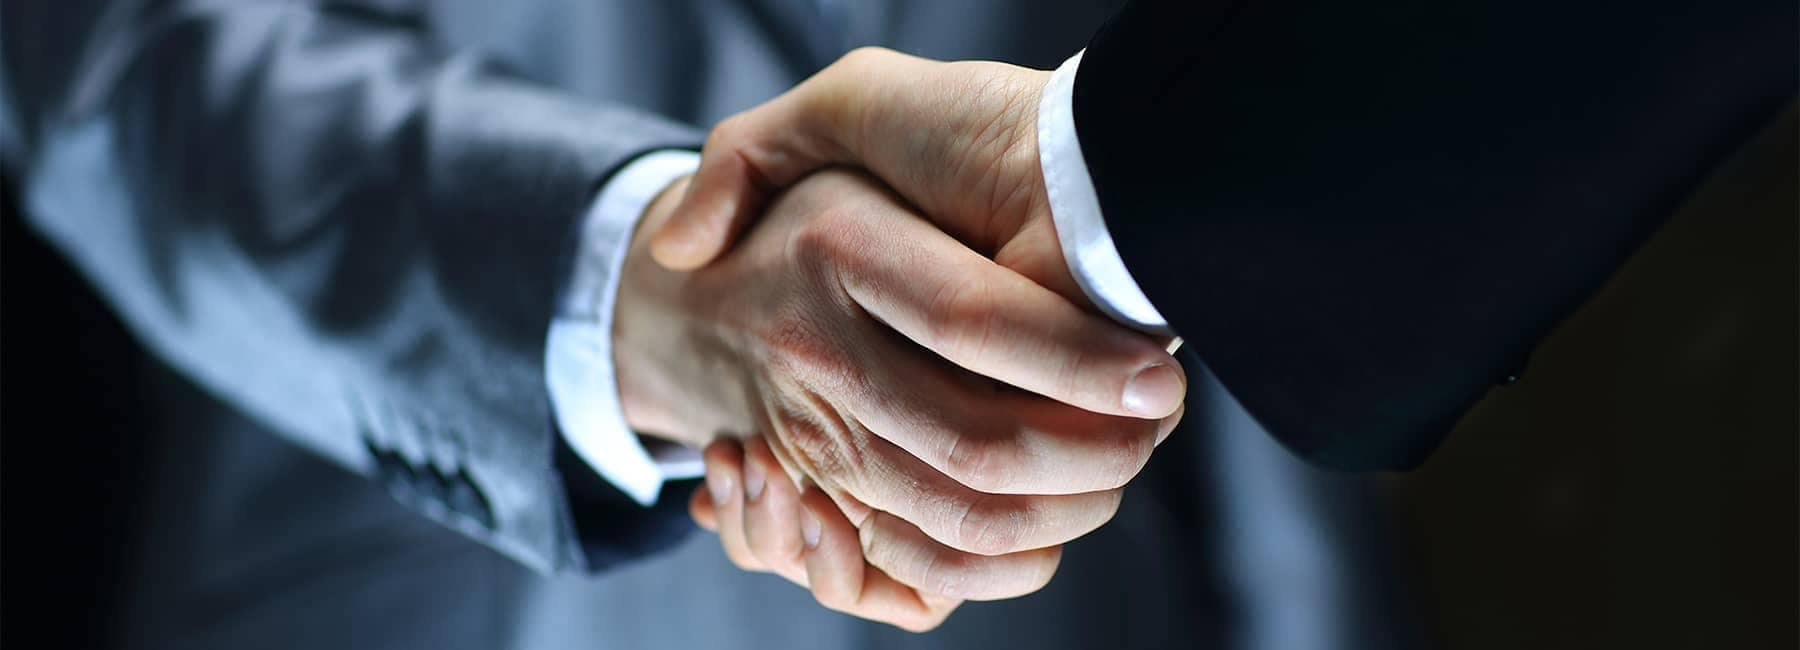 Businessmen-in-Suits-Shaking-Hands